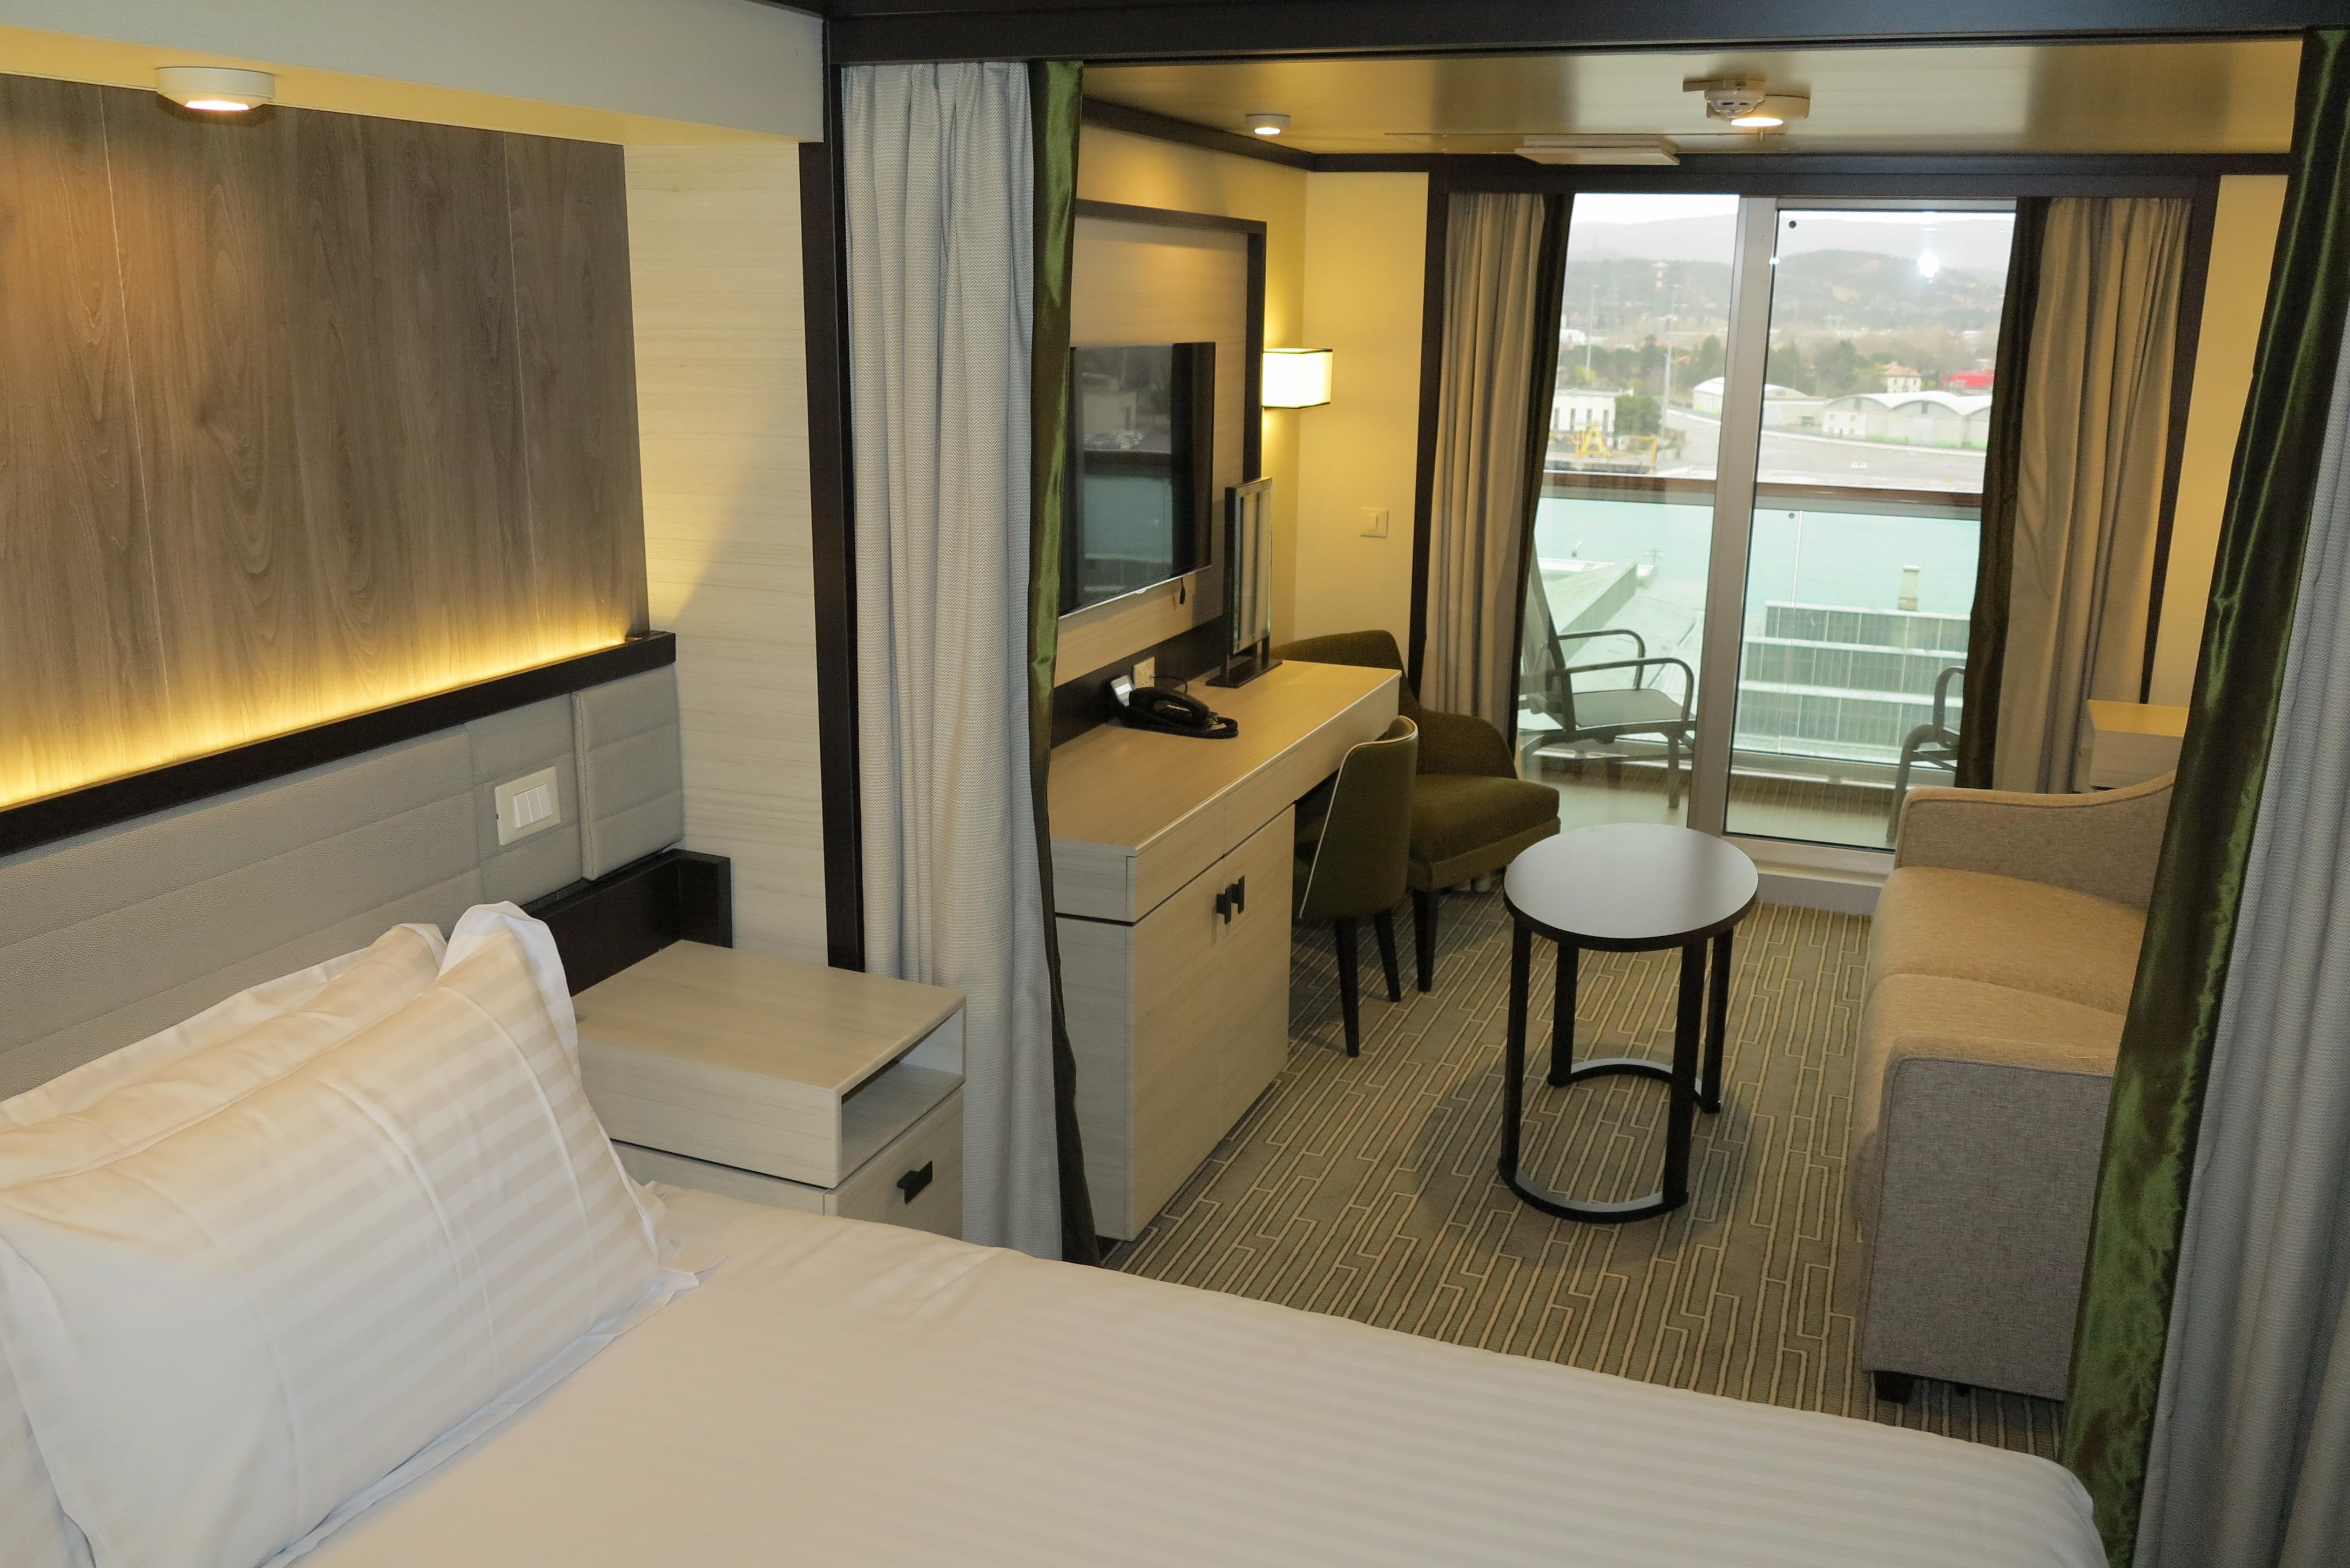 Britannia a photo tour of the p o cruises flagship at its for P o britannia dining rooms